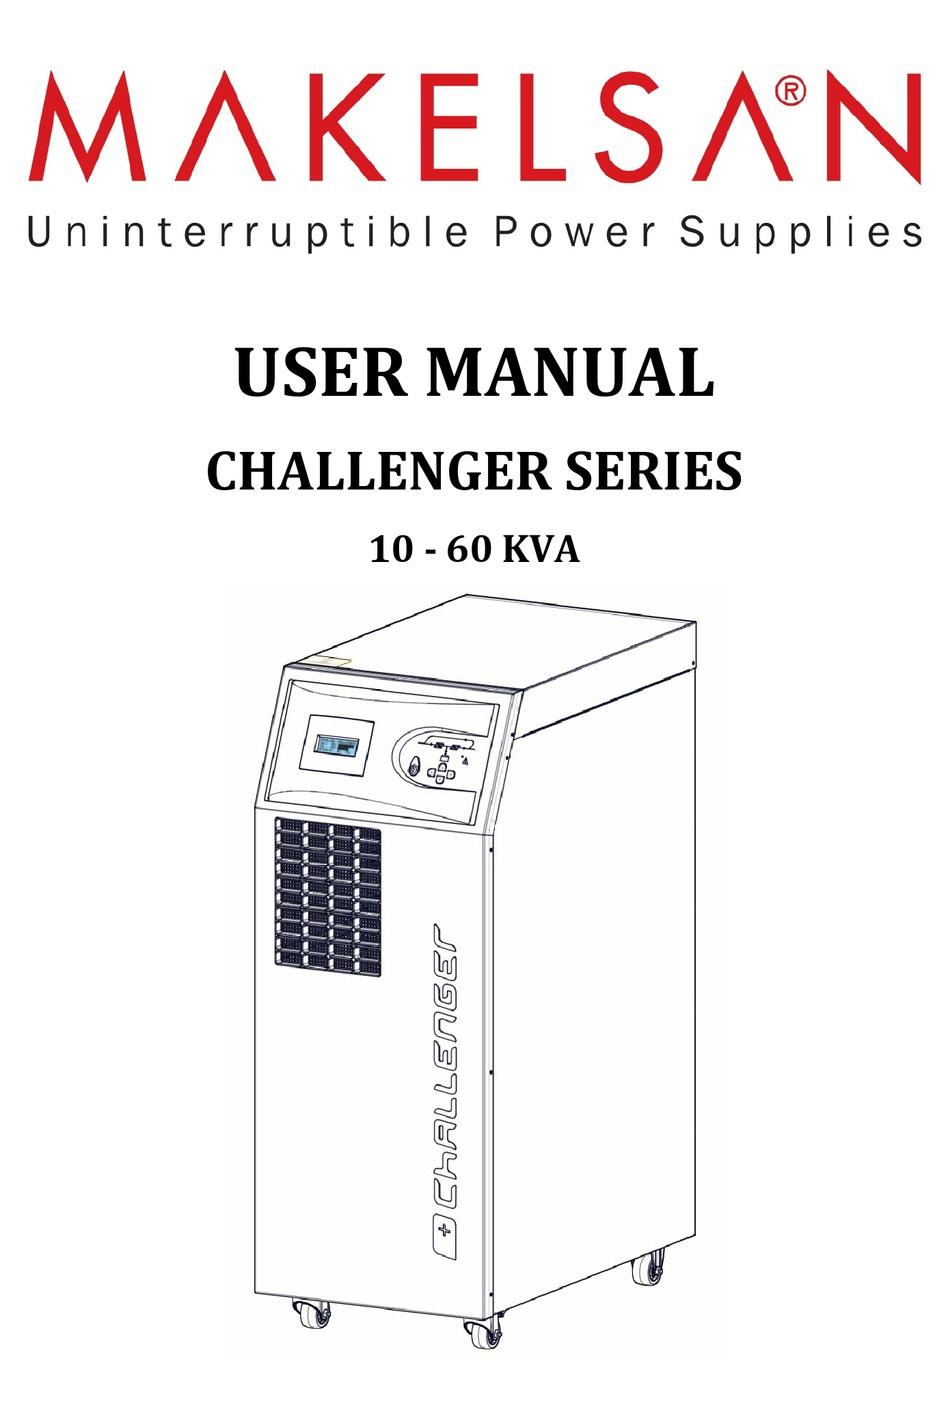 MAKELSAN CHALLENGER SERIES USER MANUAL Pdf Download